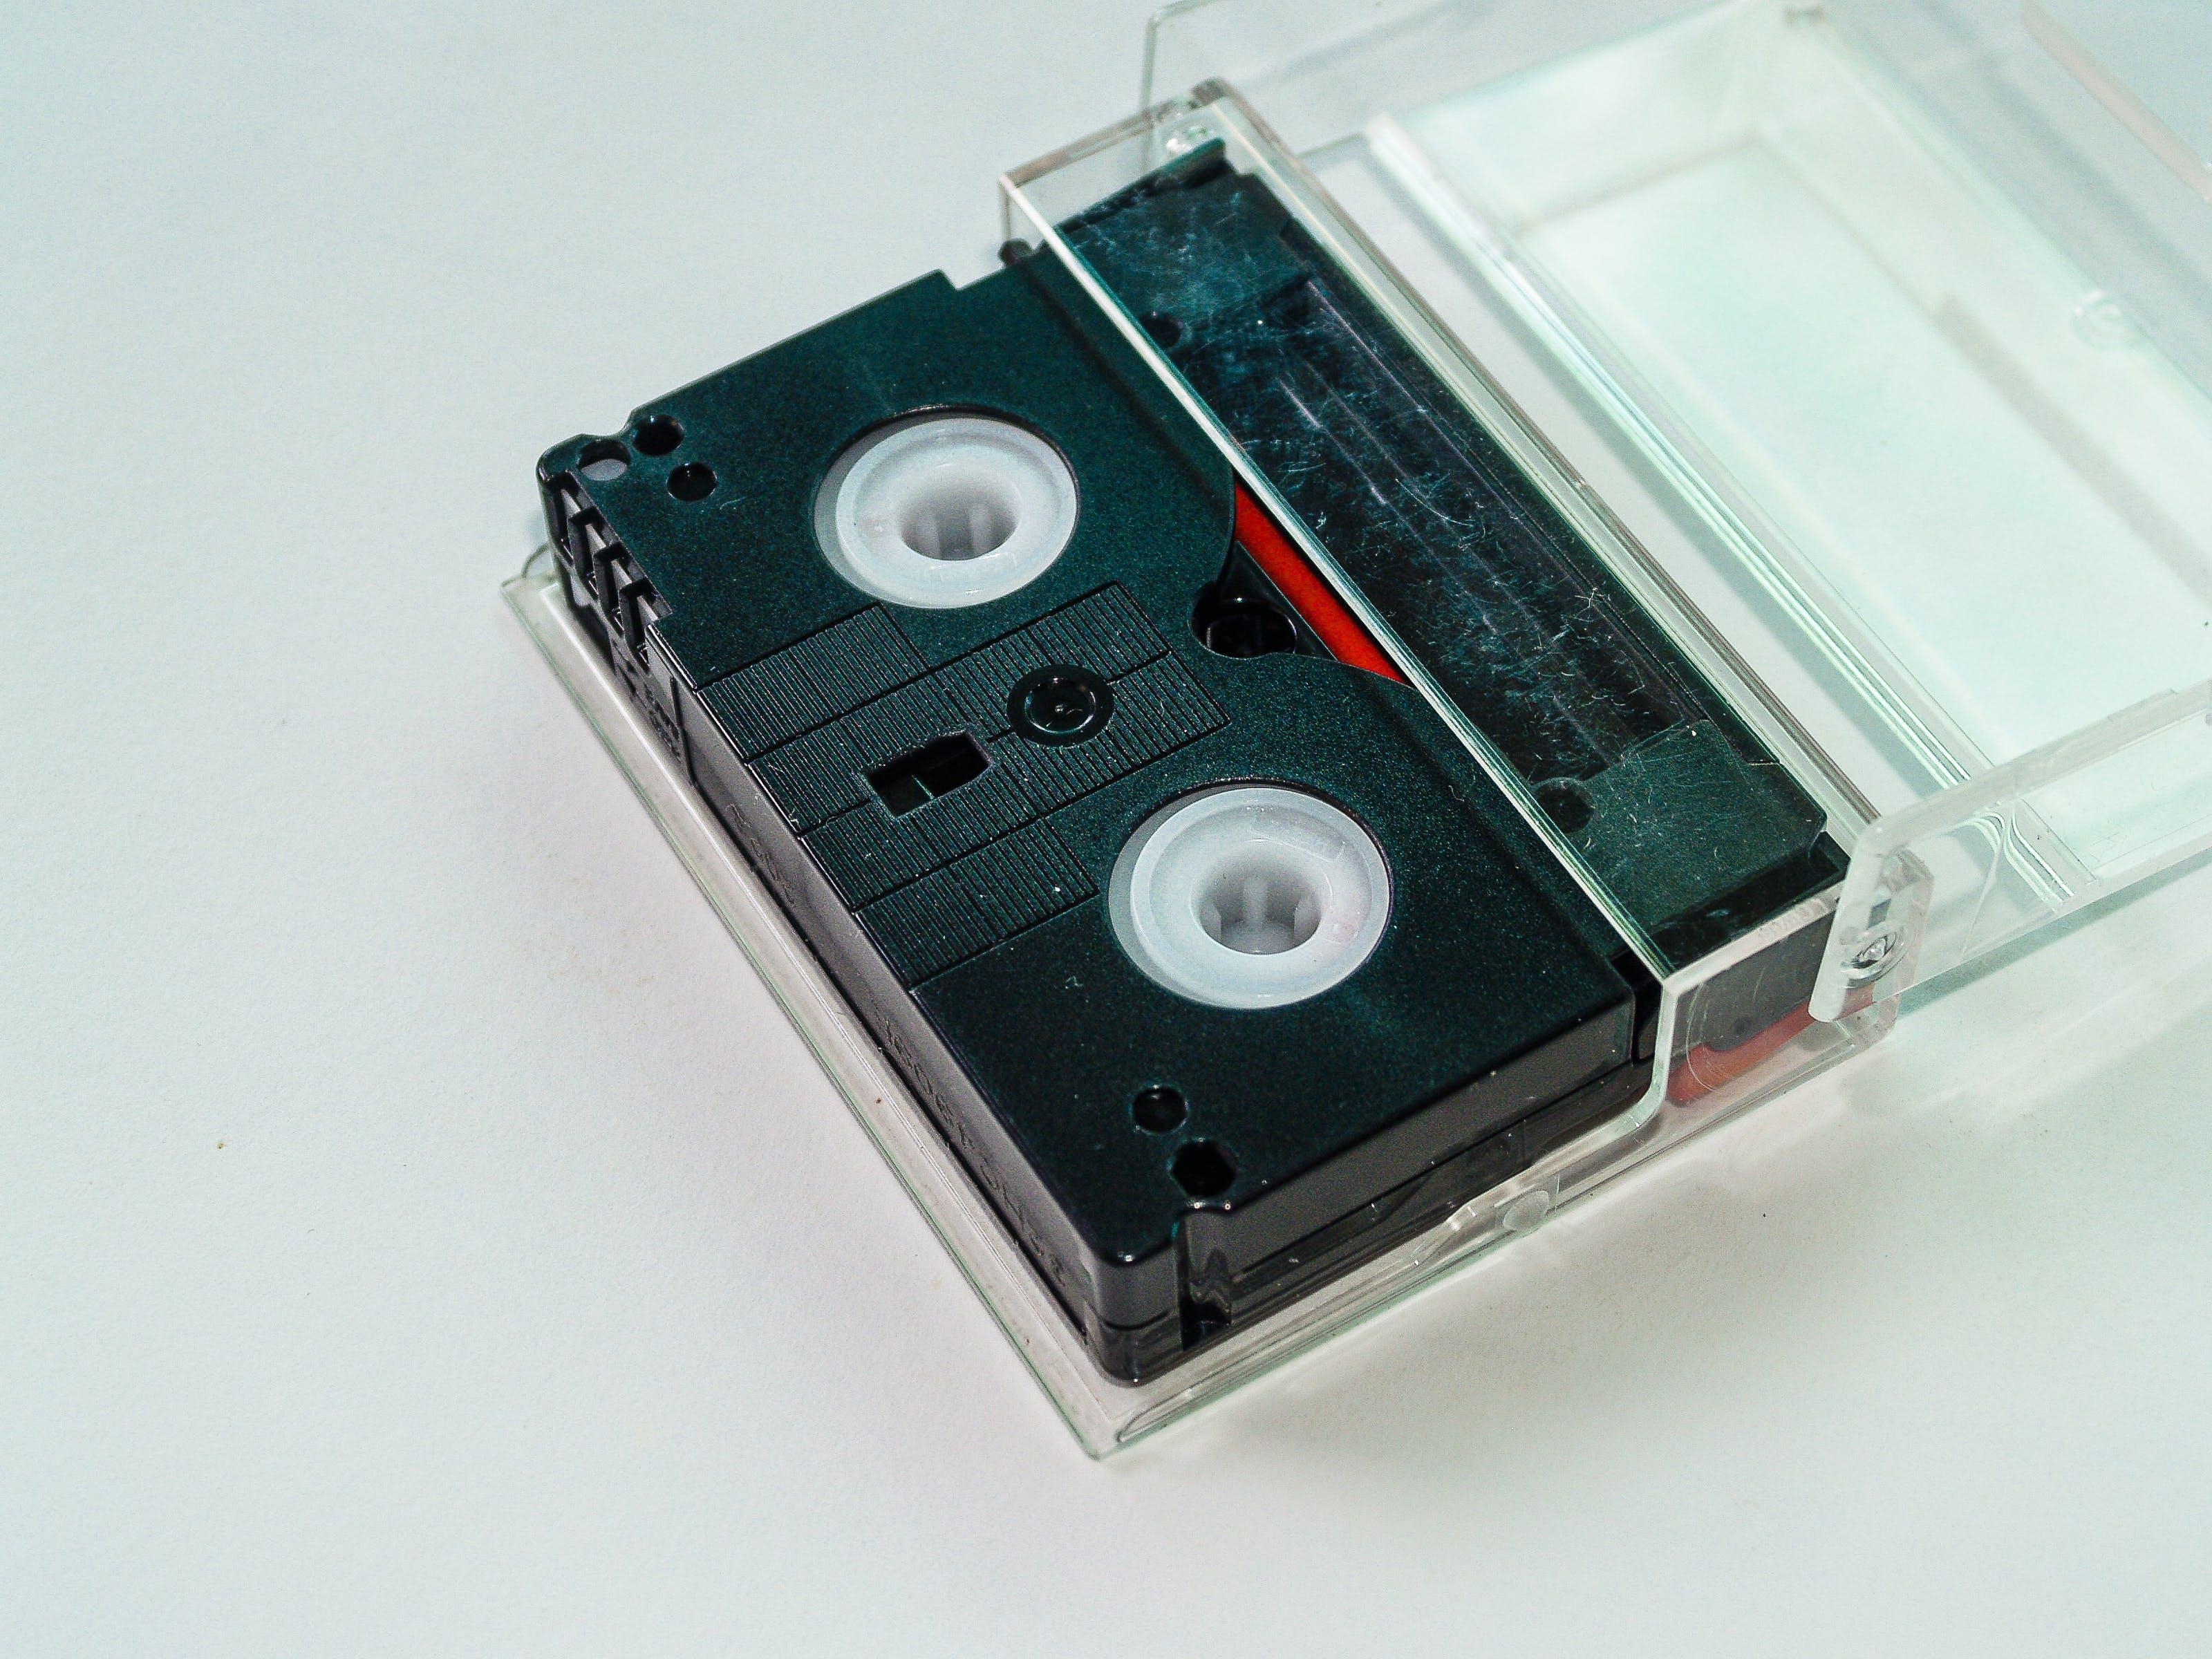 Безкоштовне стокове фото на тему «великий план, всередині, запис, касета»